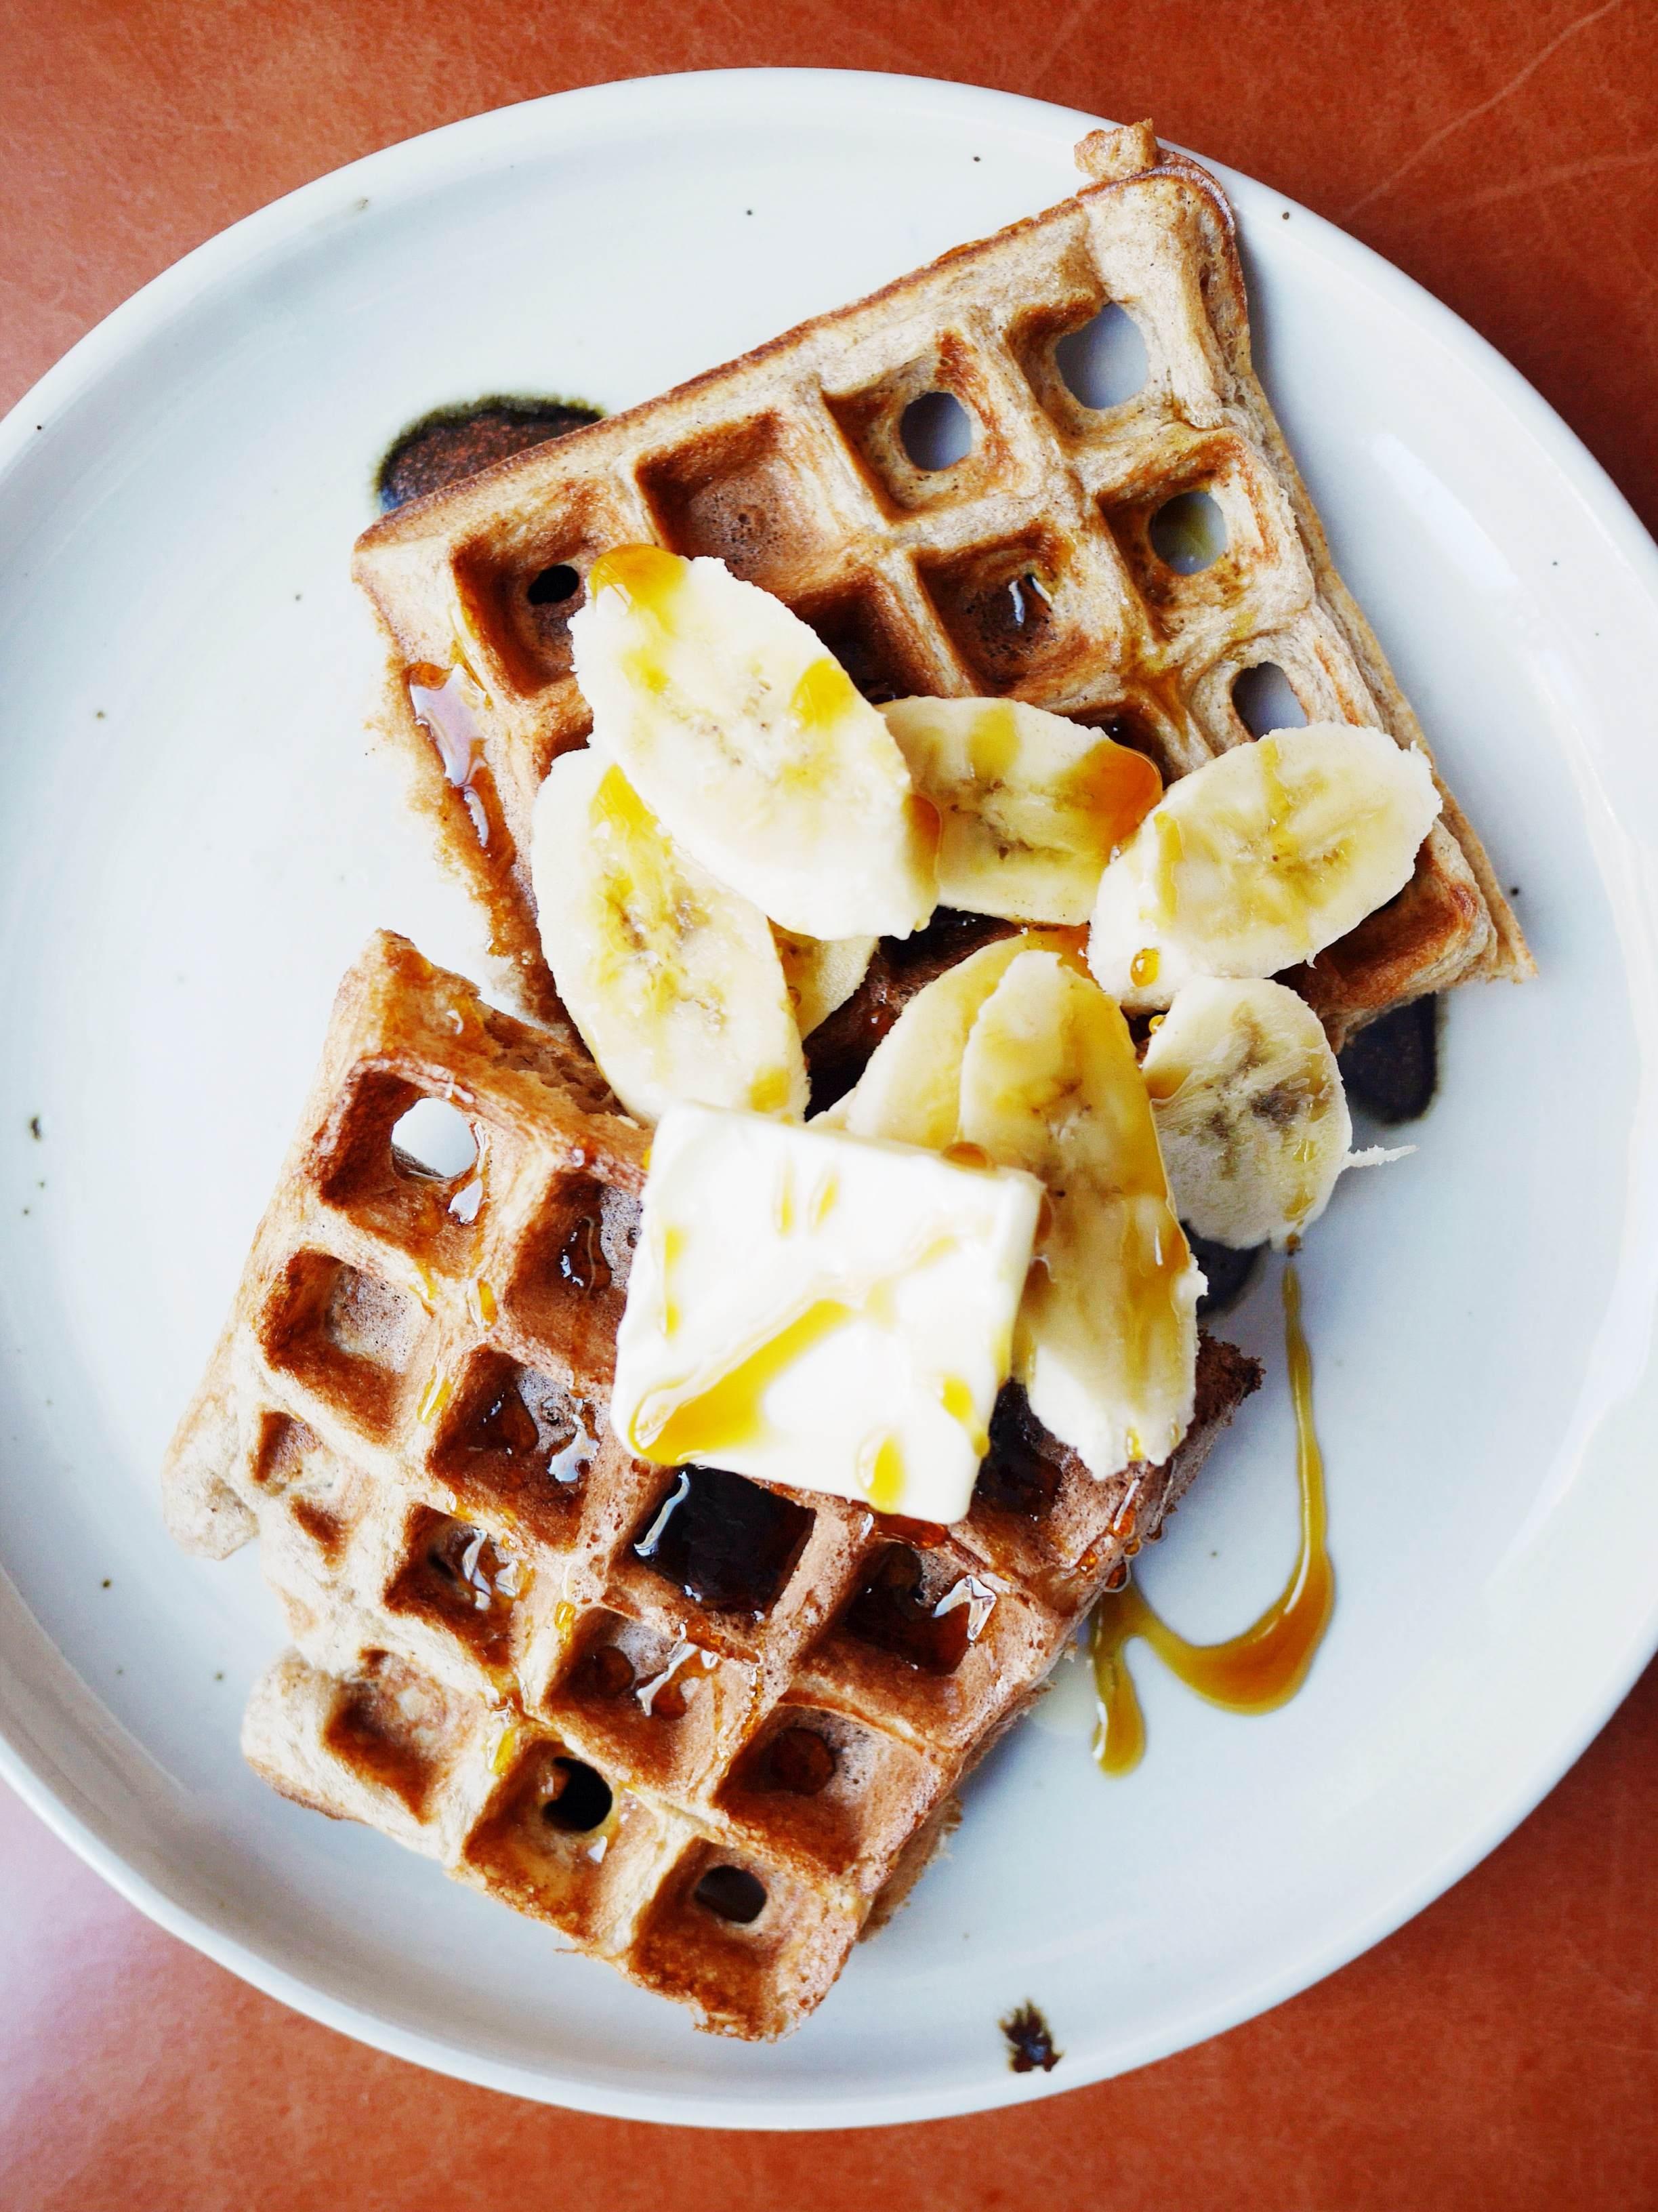 spiced-cardamom-and-rye-waffle-recipe.jpg